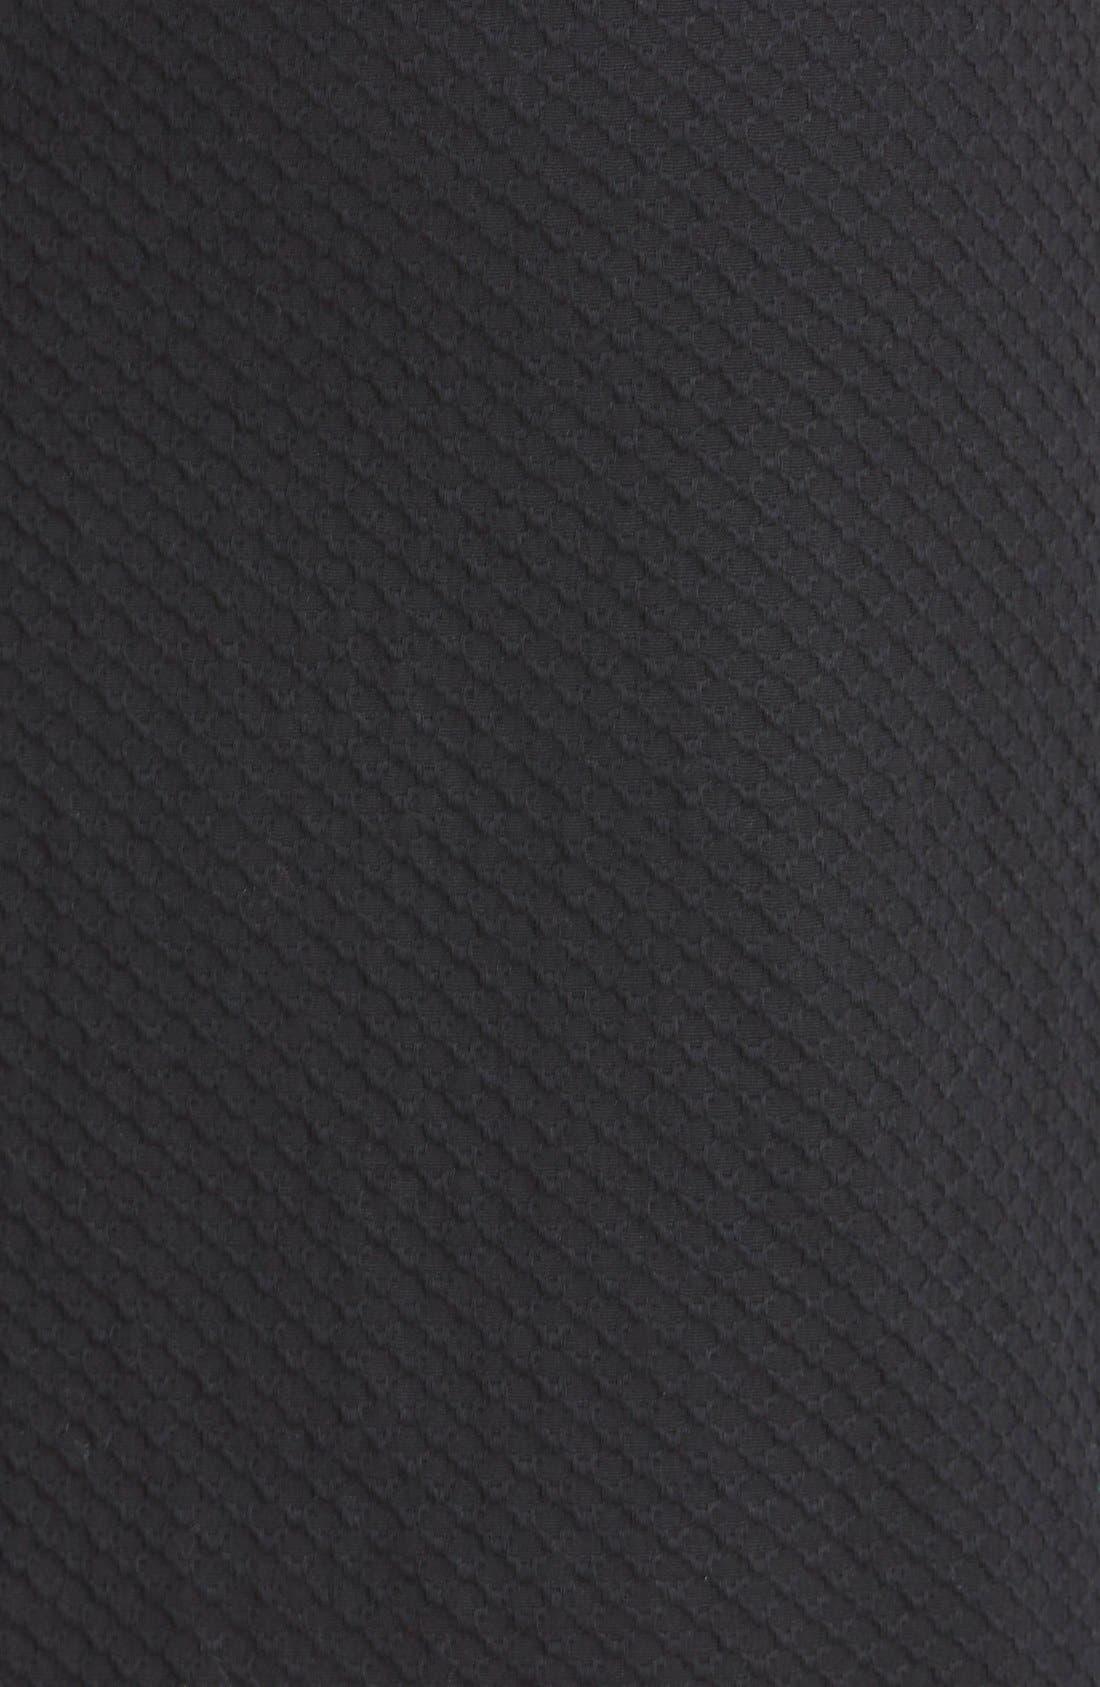 Welt Pocket Pencil Skirt,                             Alternate thumbnail 3, color,                             002